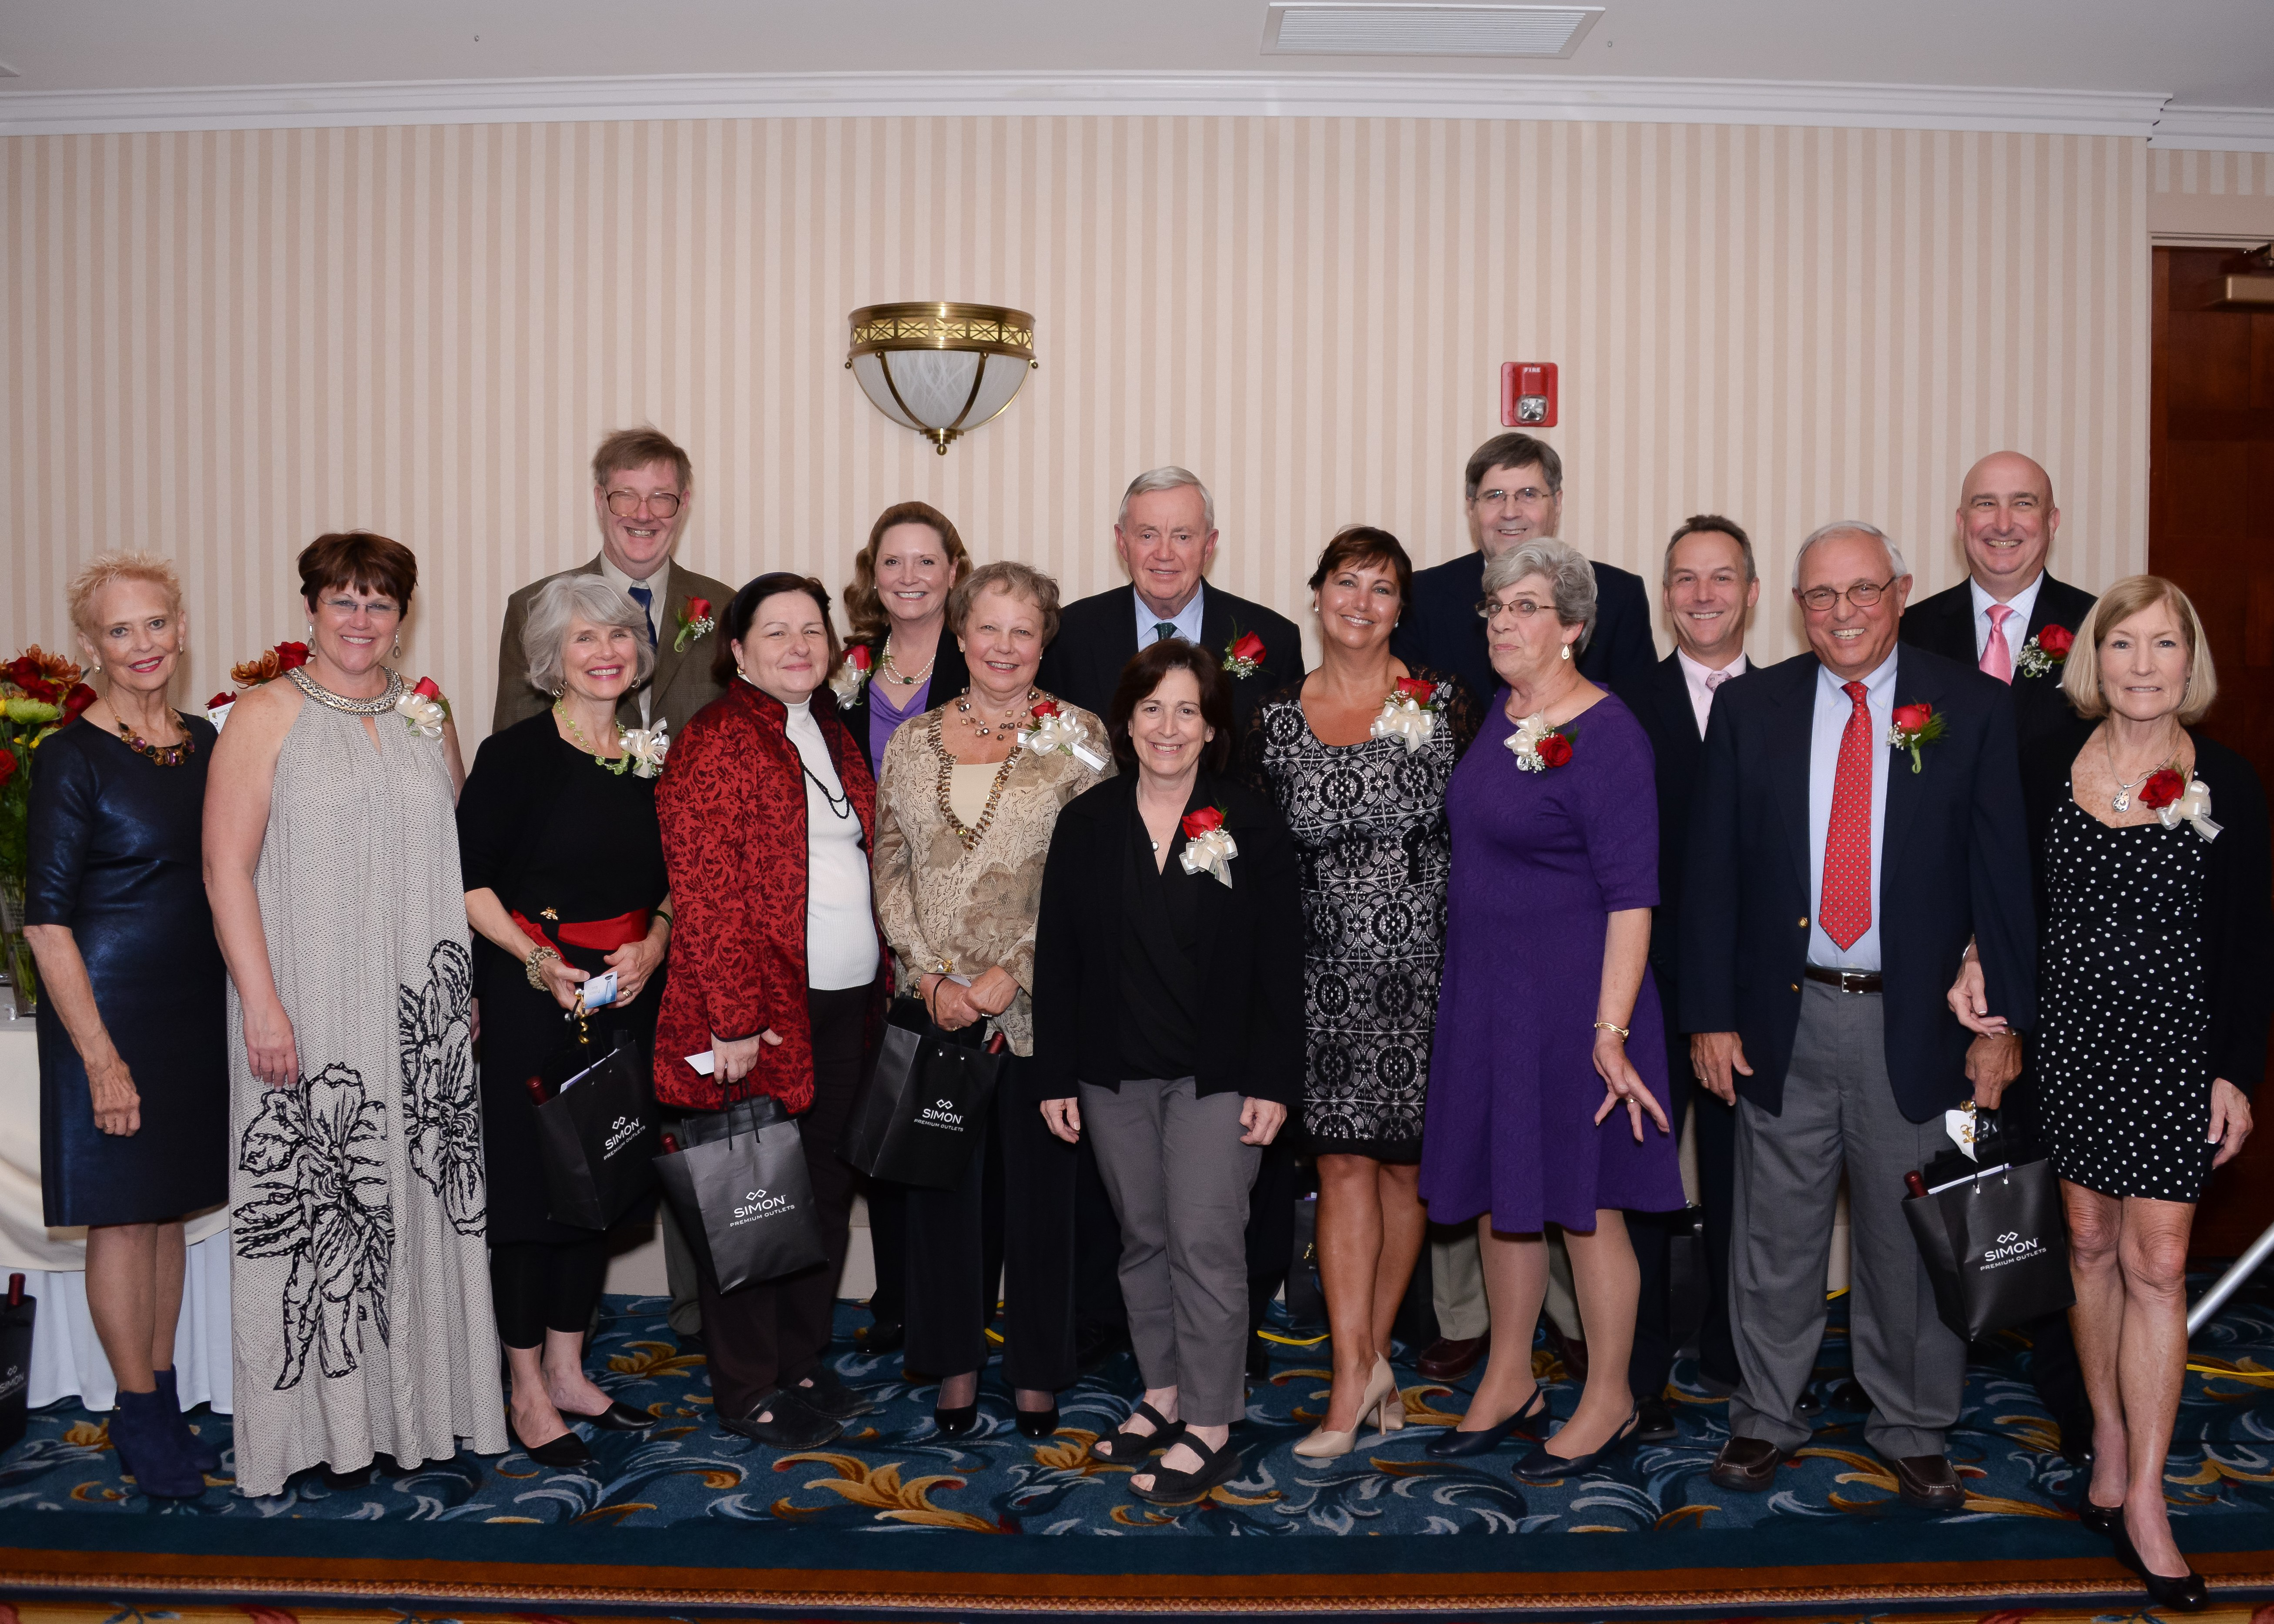 2015 Beacon Award Winners (Joe Goldberg is missing from this photo) Photo by Kelley Fryer/Zip06